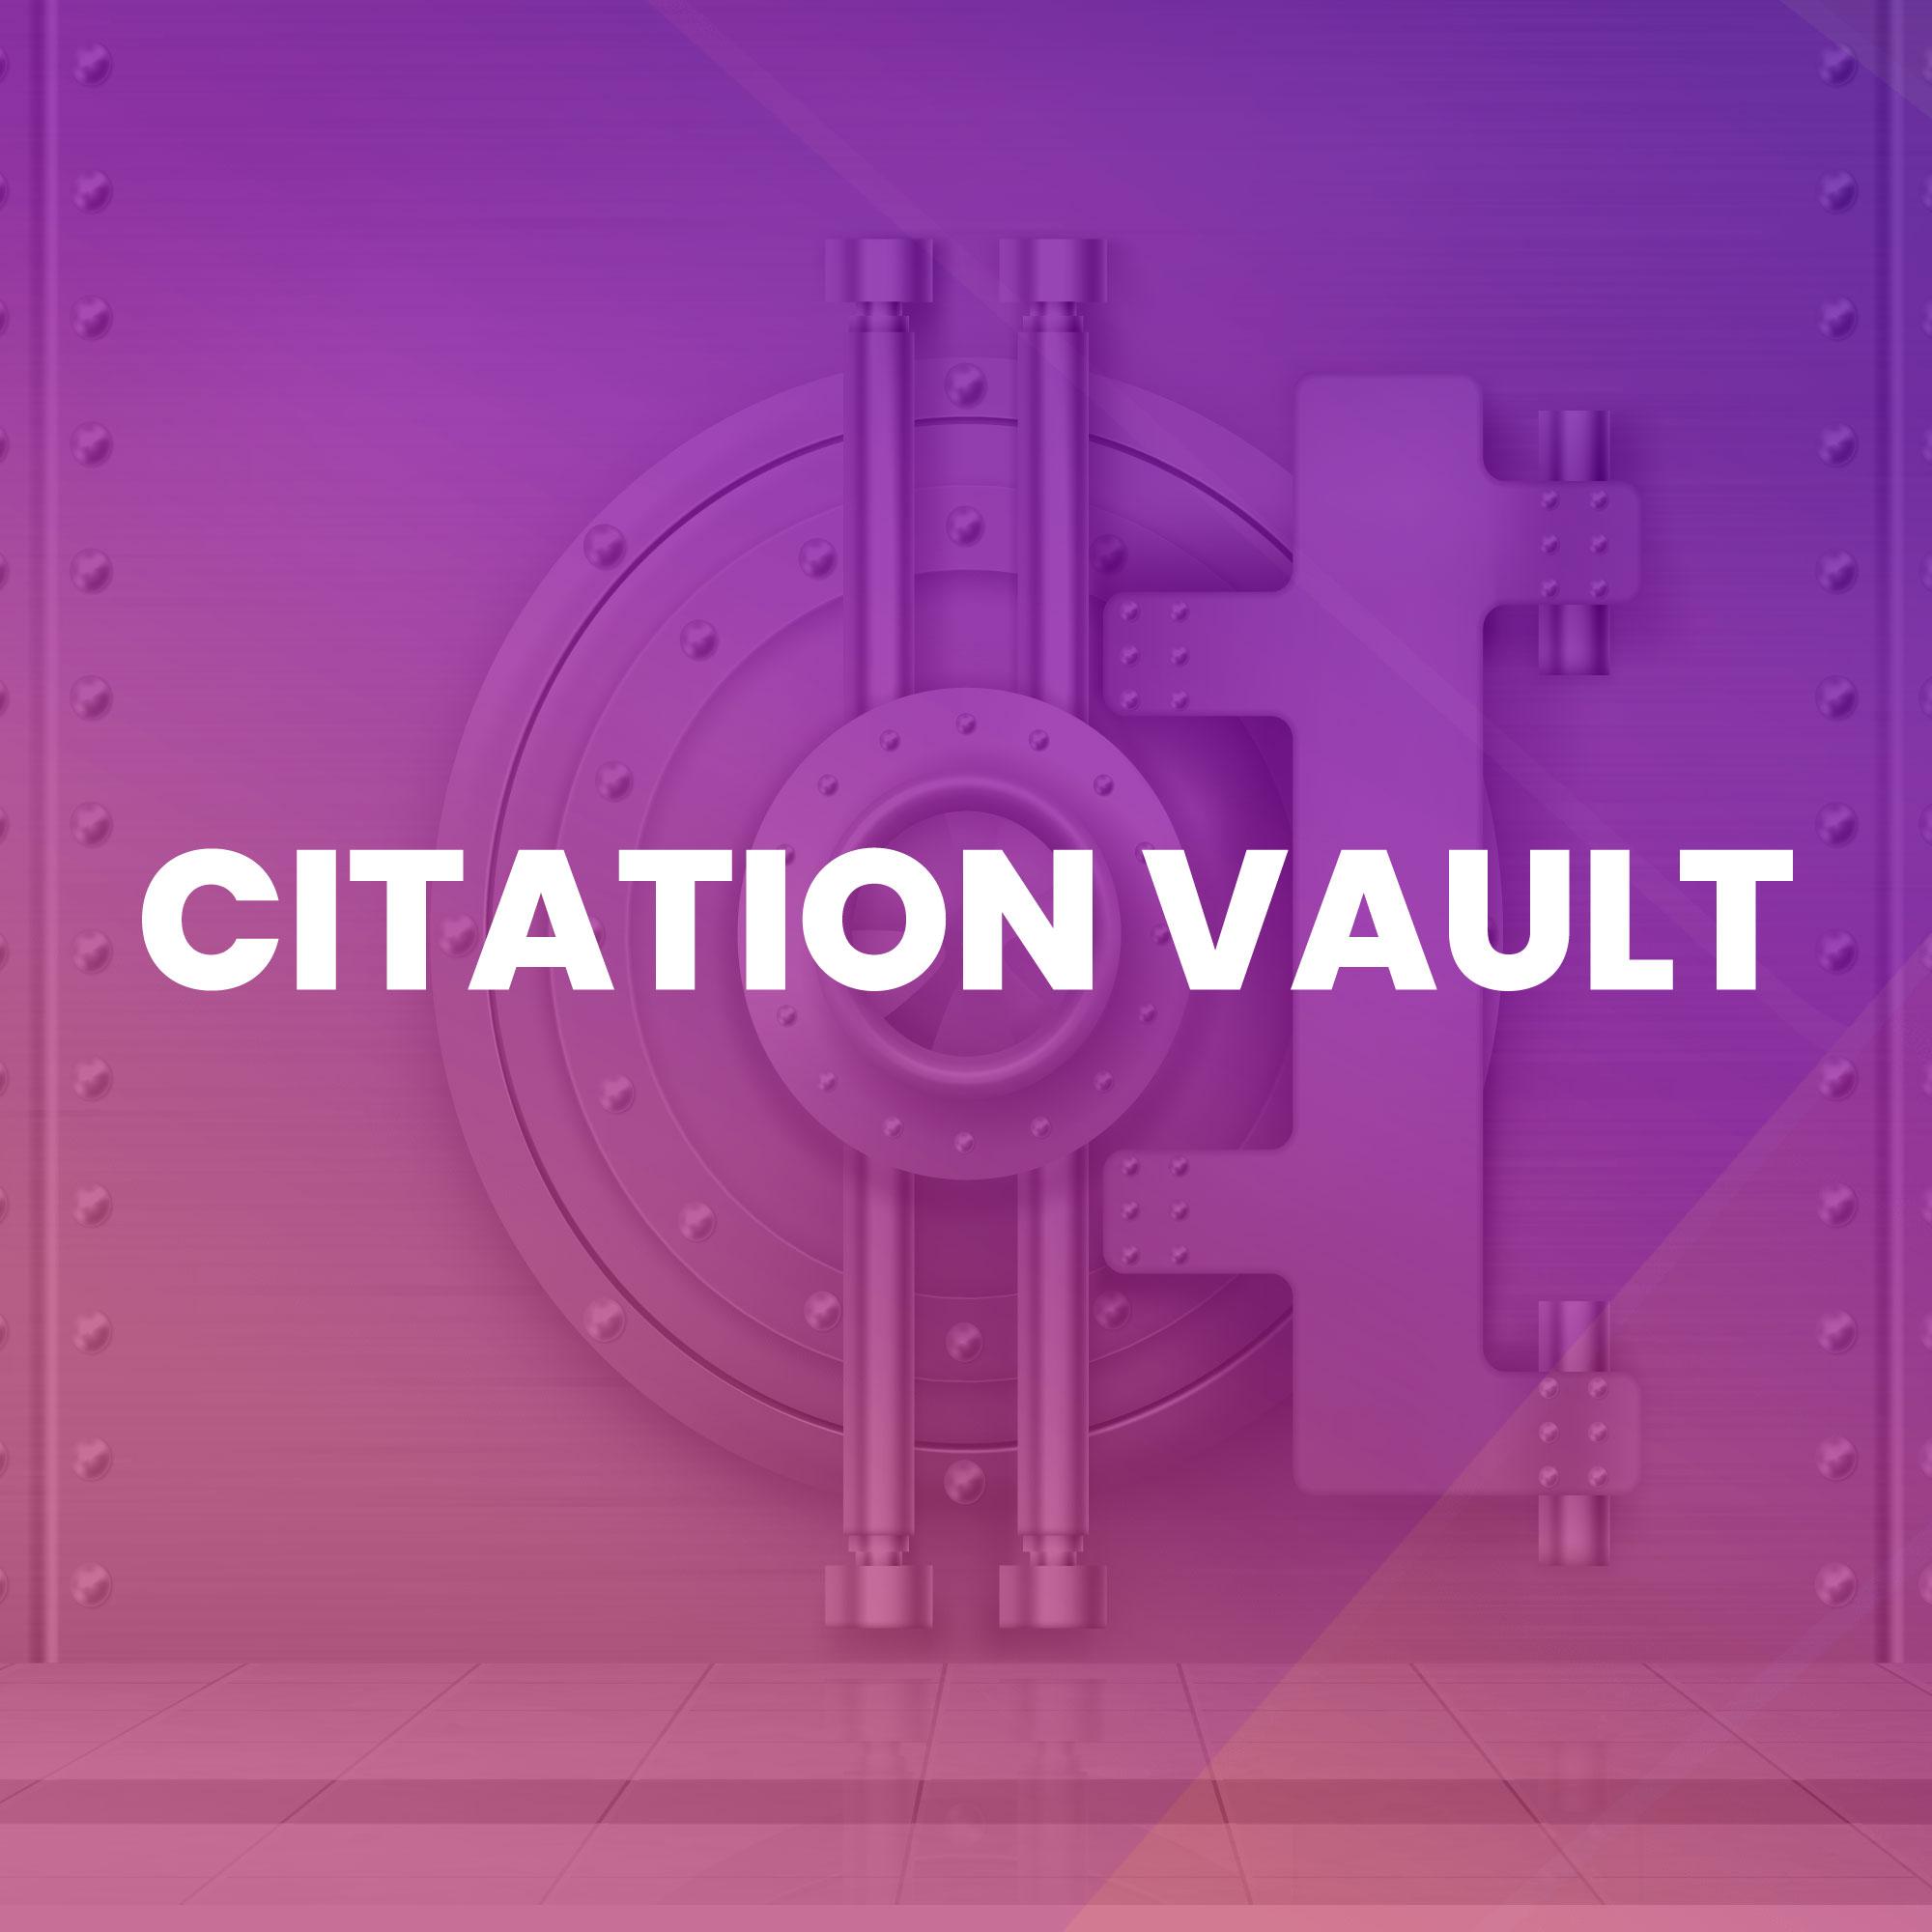 Citation-Vault-FB-Cover-2.jpg